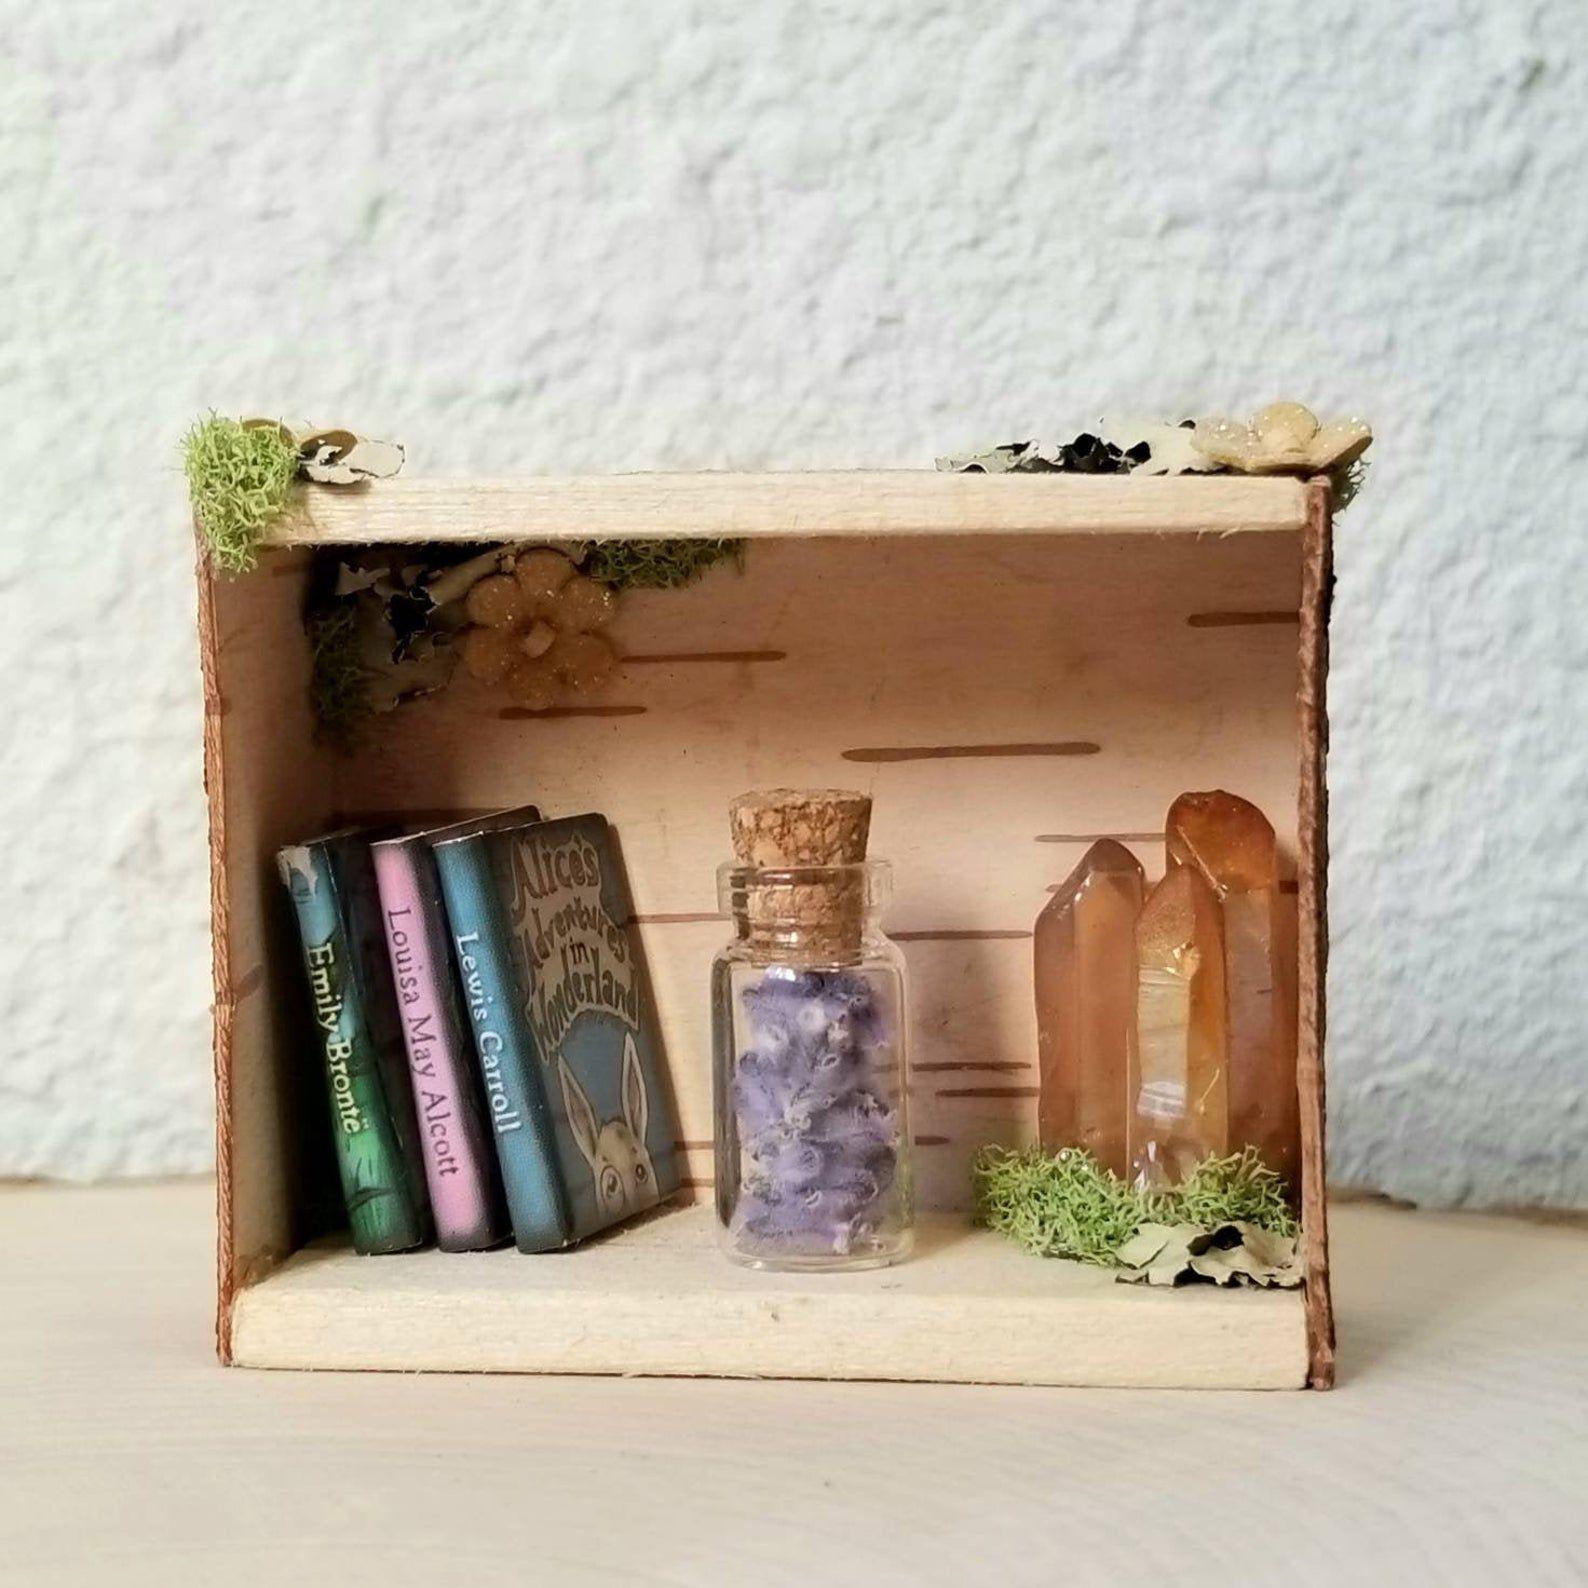 miniature bookshelf with crystals